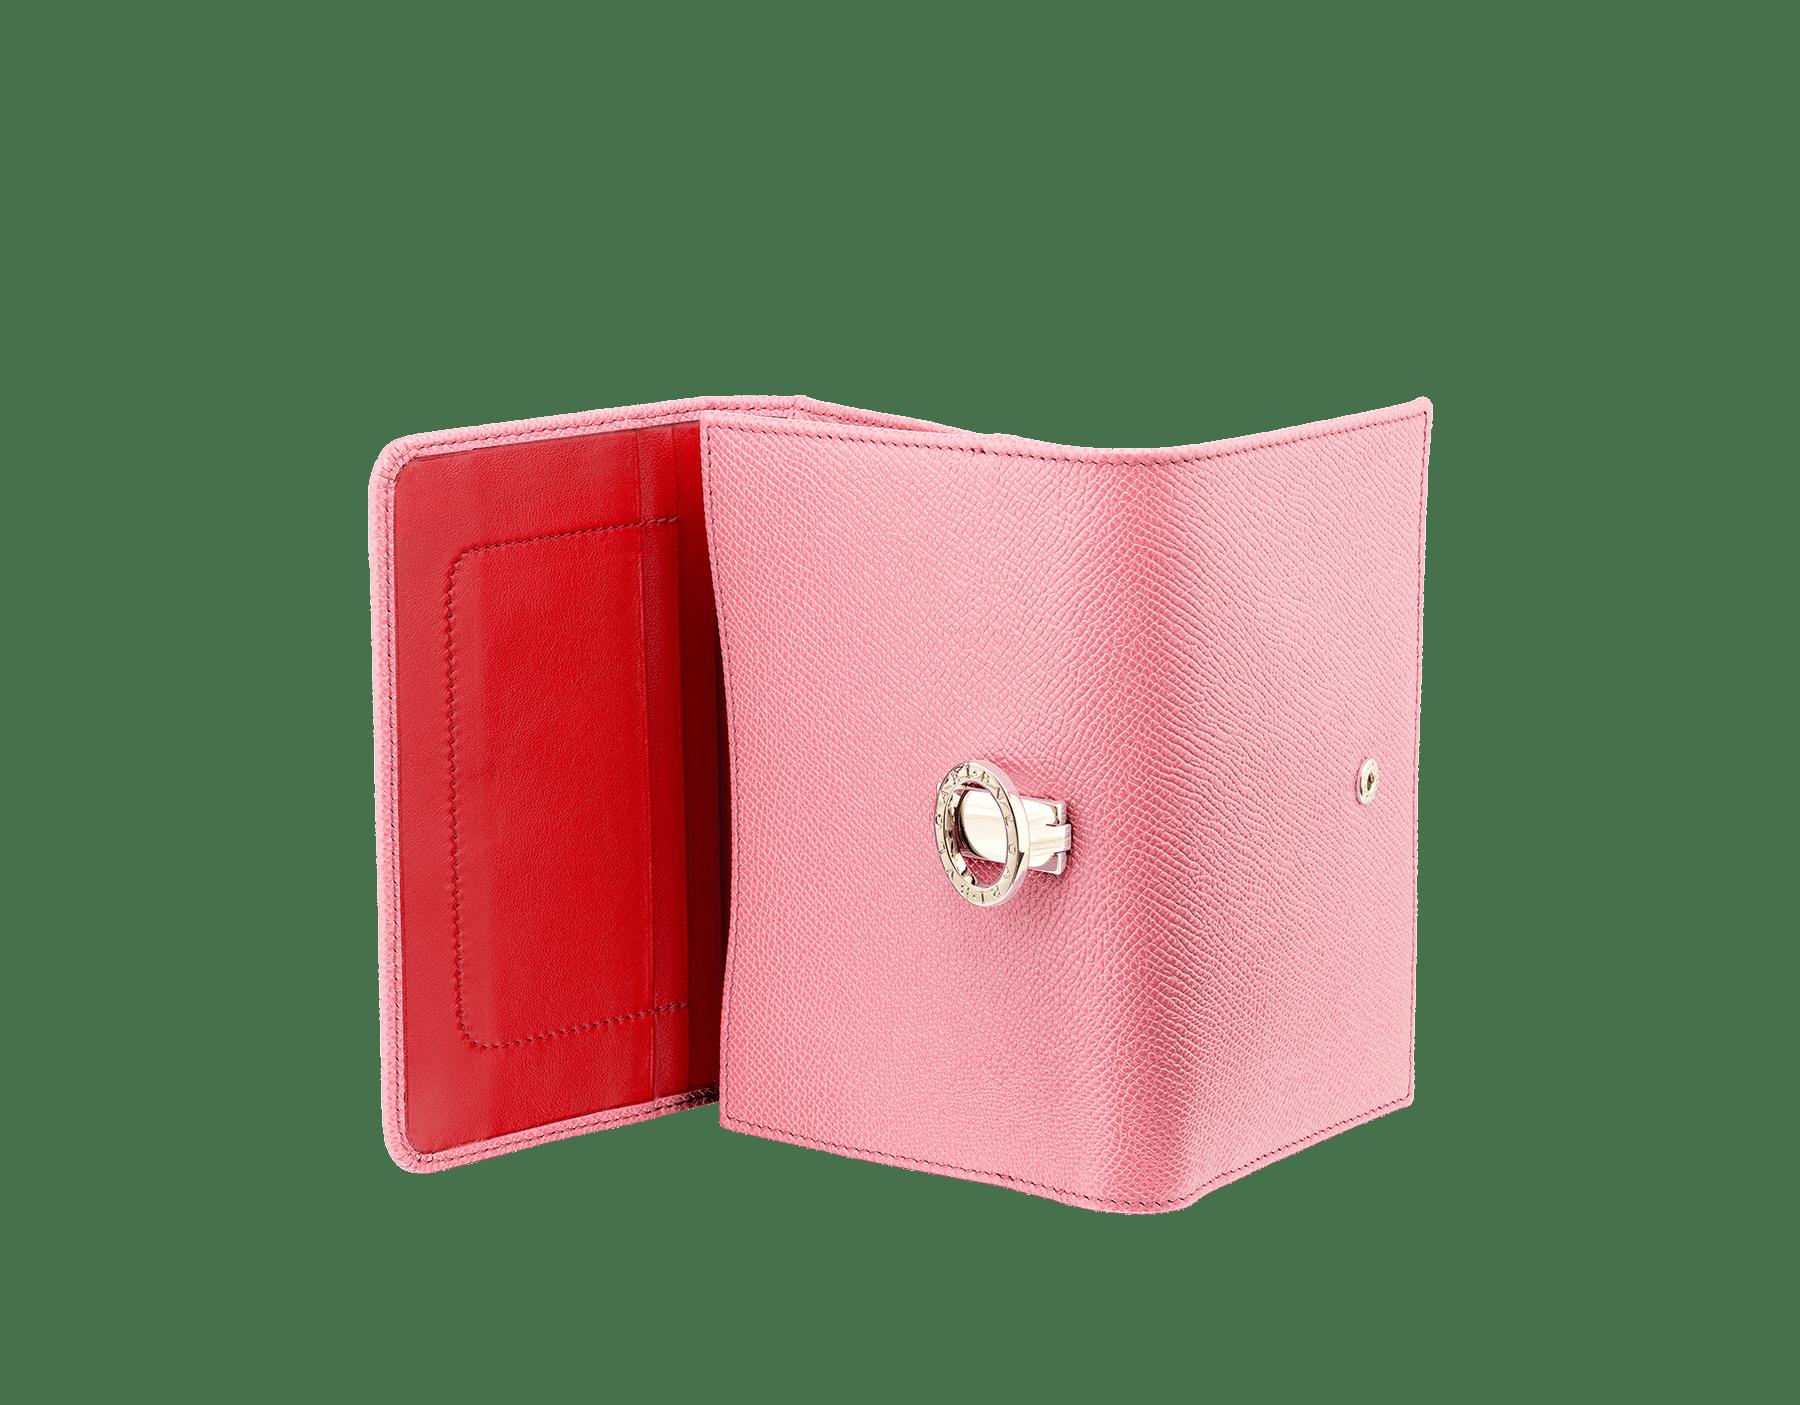 BVLGARI BVLGARI 糖果石英色亮珠面小牛皮和洋紅碧玉色 Nappa 軟面皮小巧手拿包,寶格麗經典標誌淡金色黃銅扣環。 287607 image 3